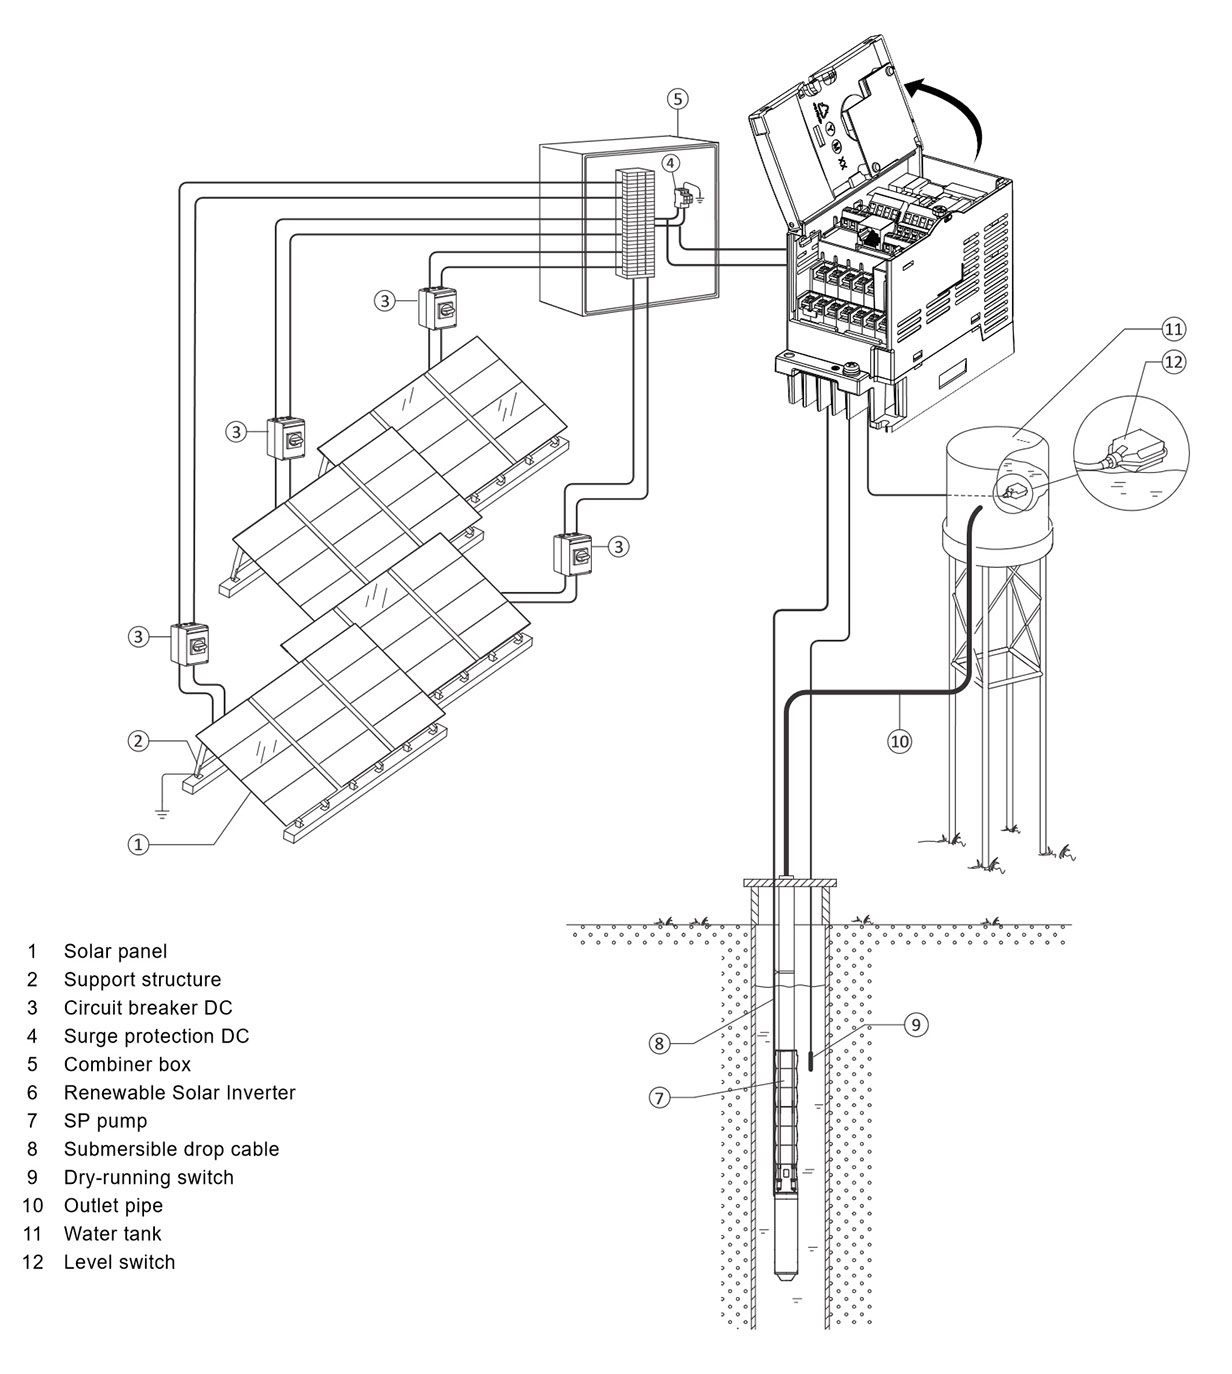 schema electrique dune pompe immerg u00e9e triphas u00e9e pdf